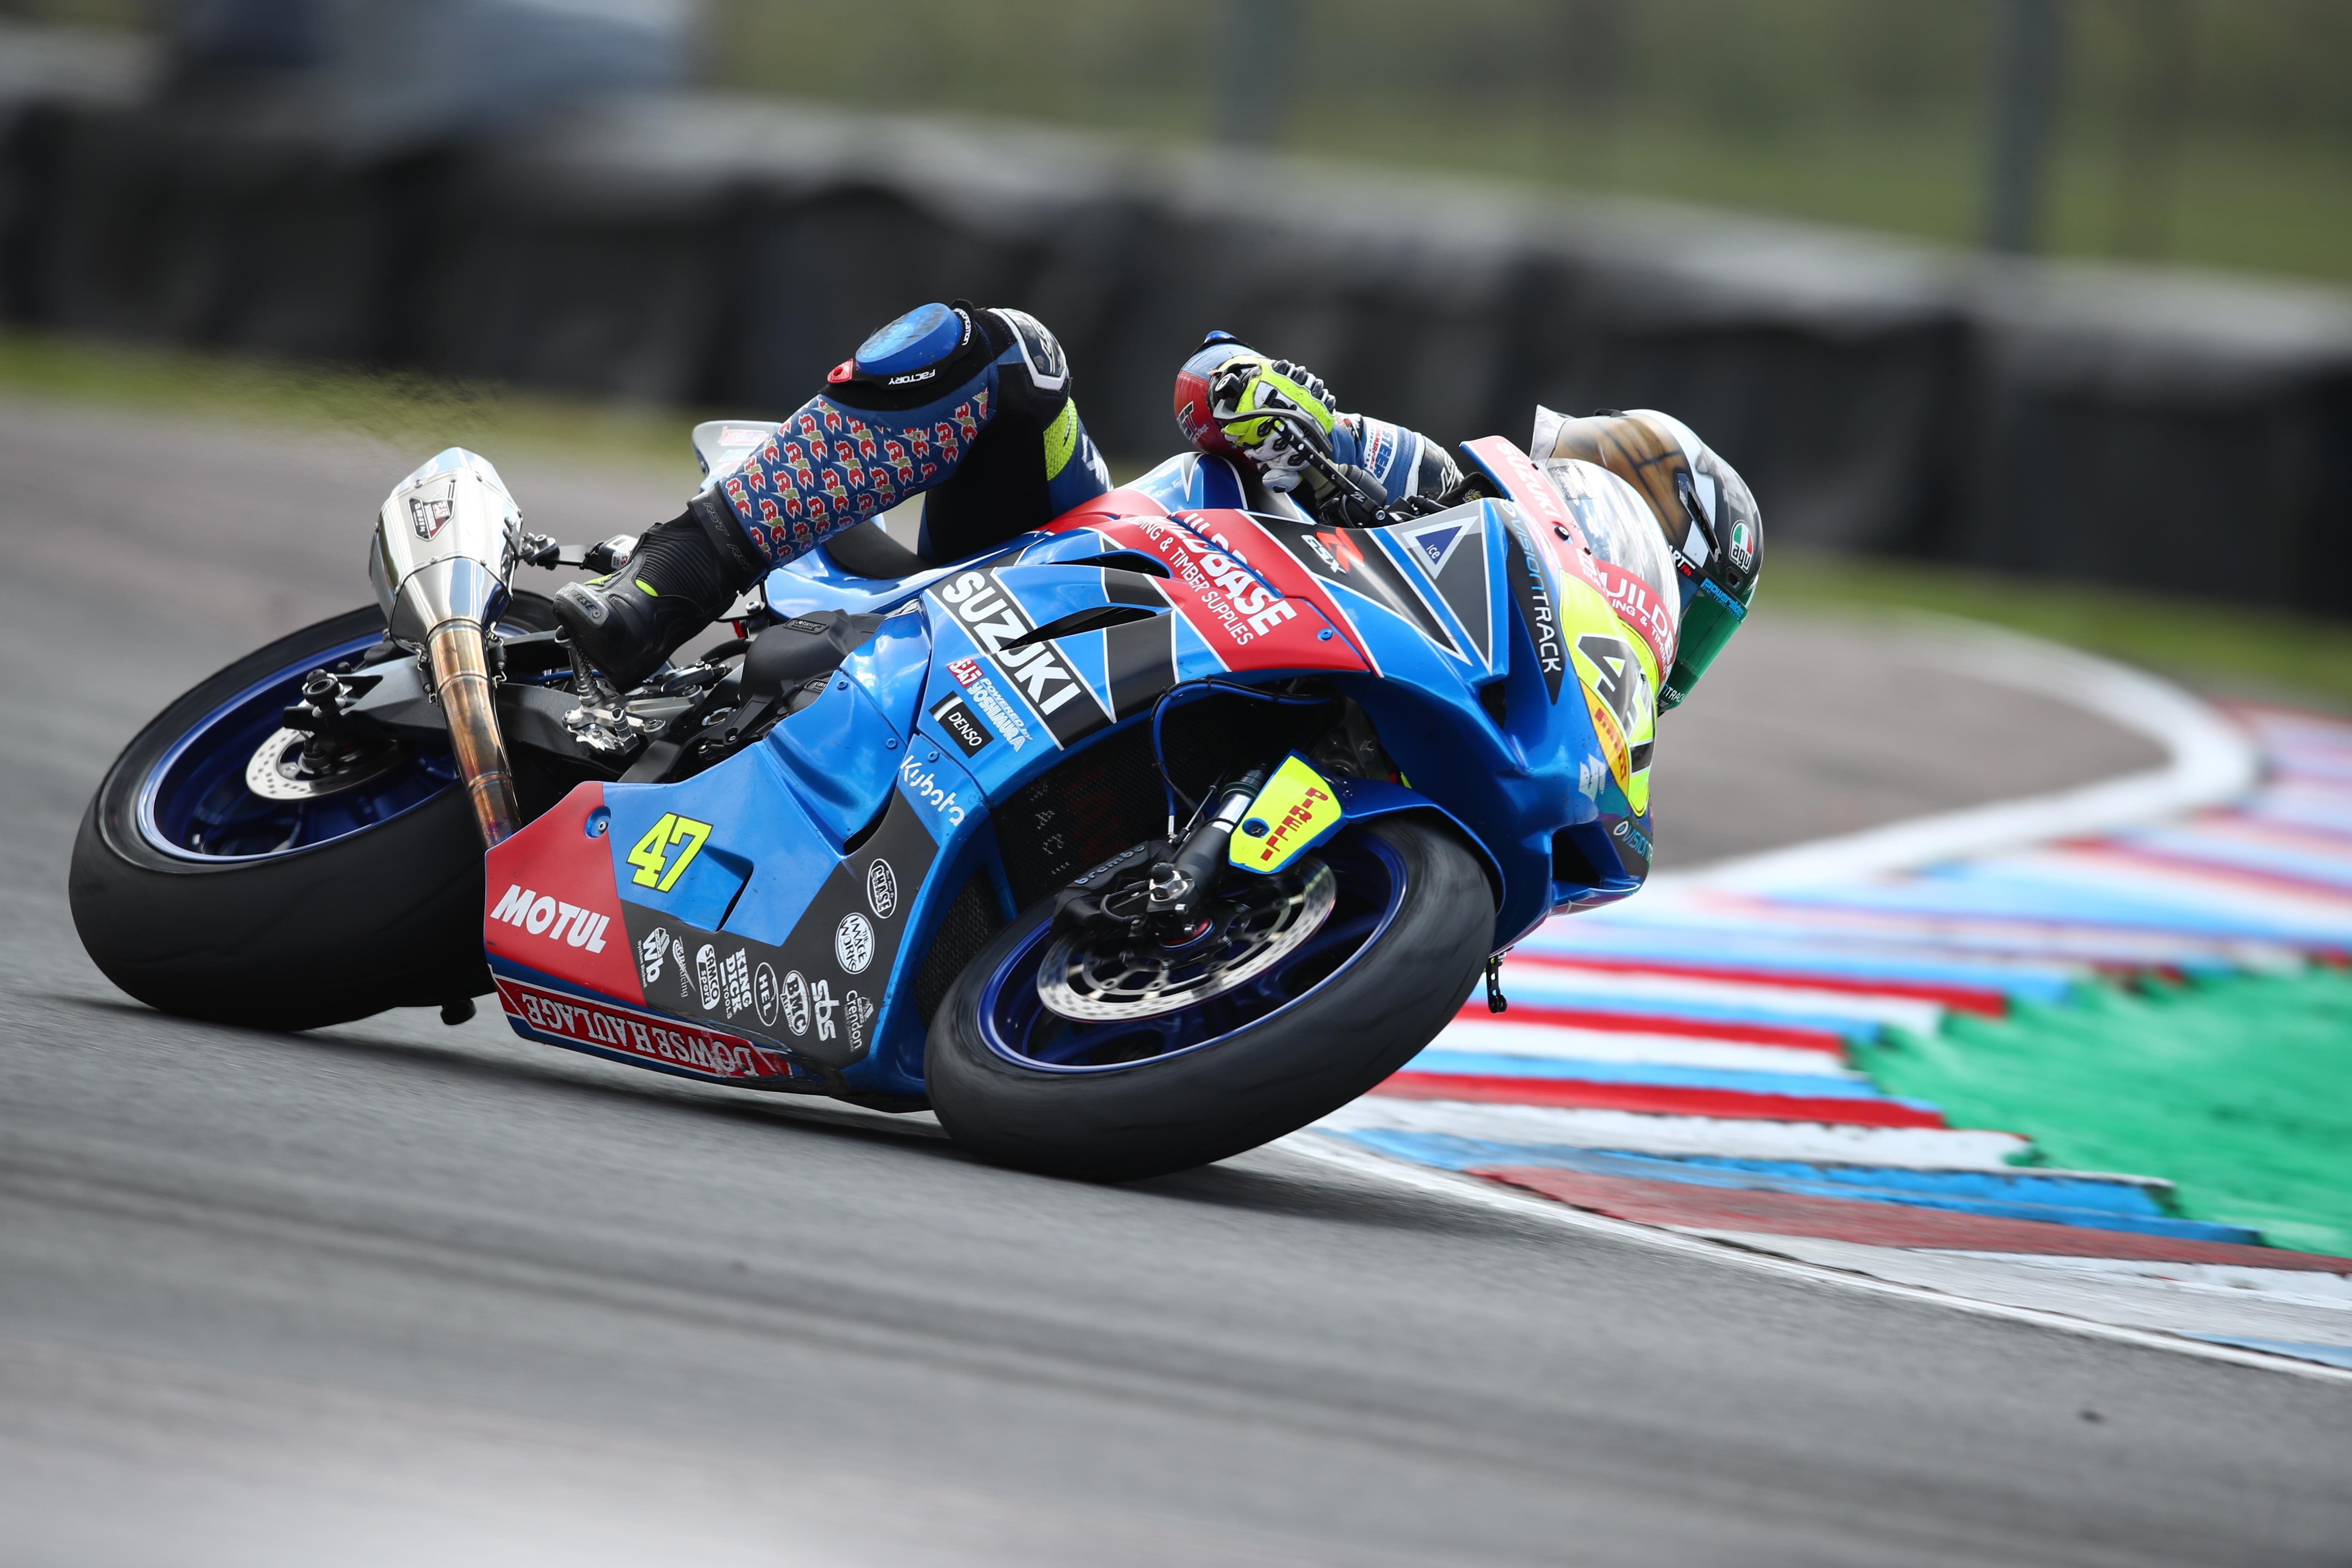 Superstock Champion Cooper To Ride Superbike At Assen